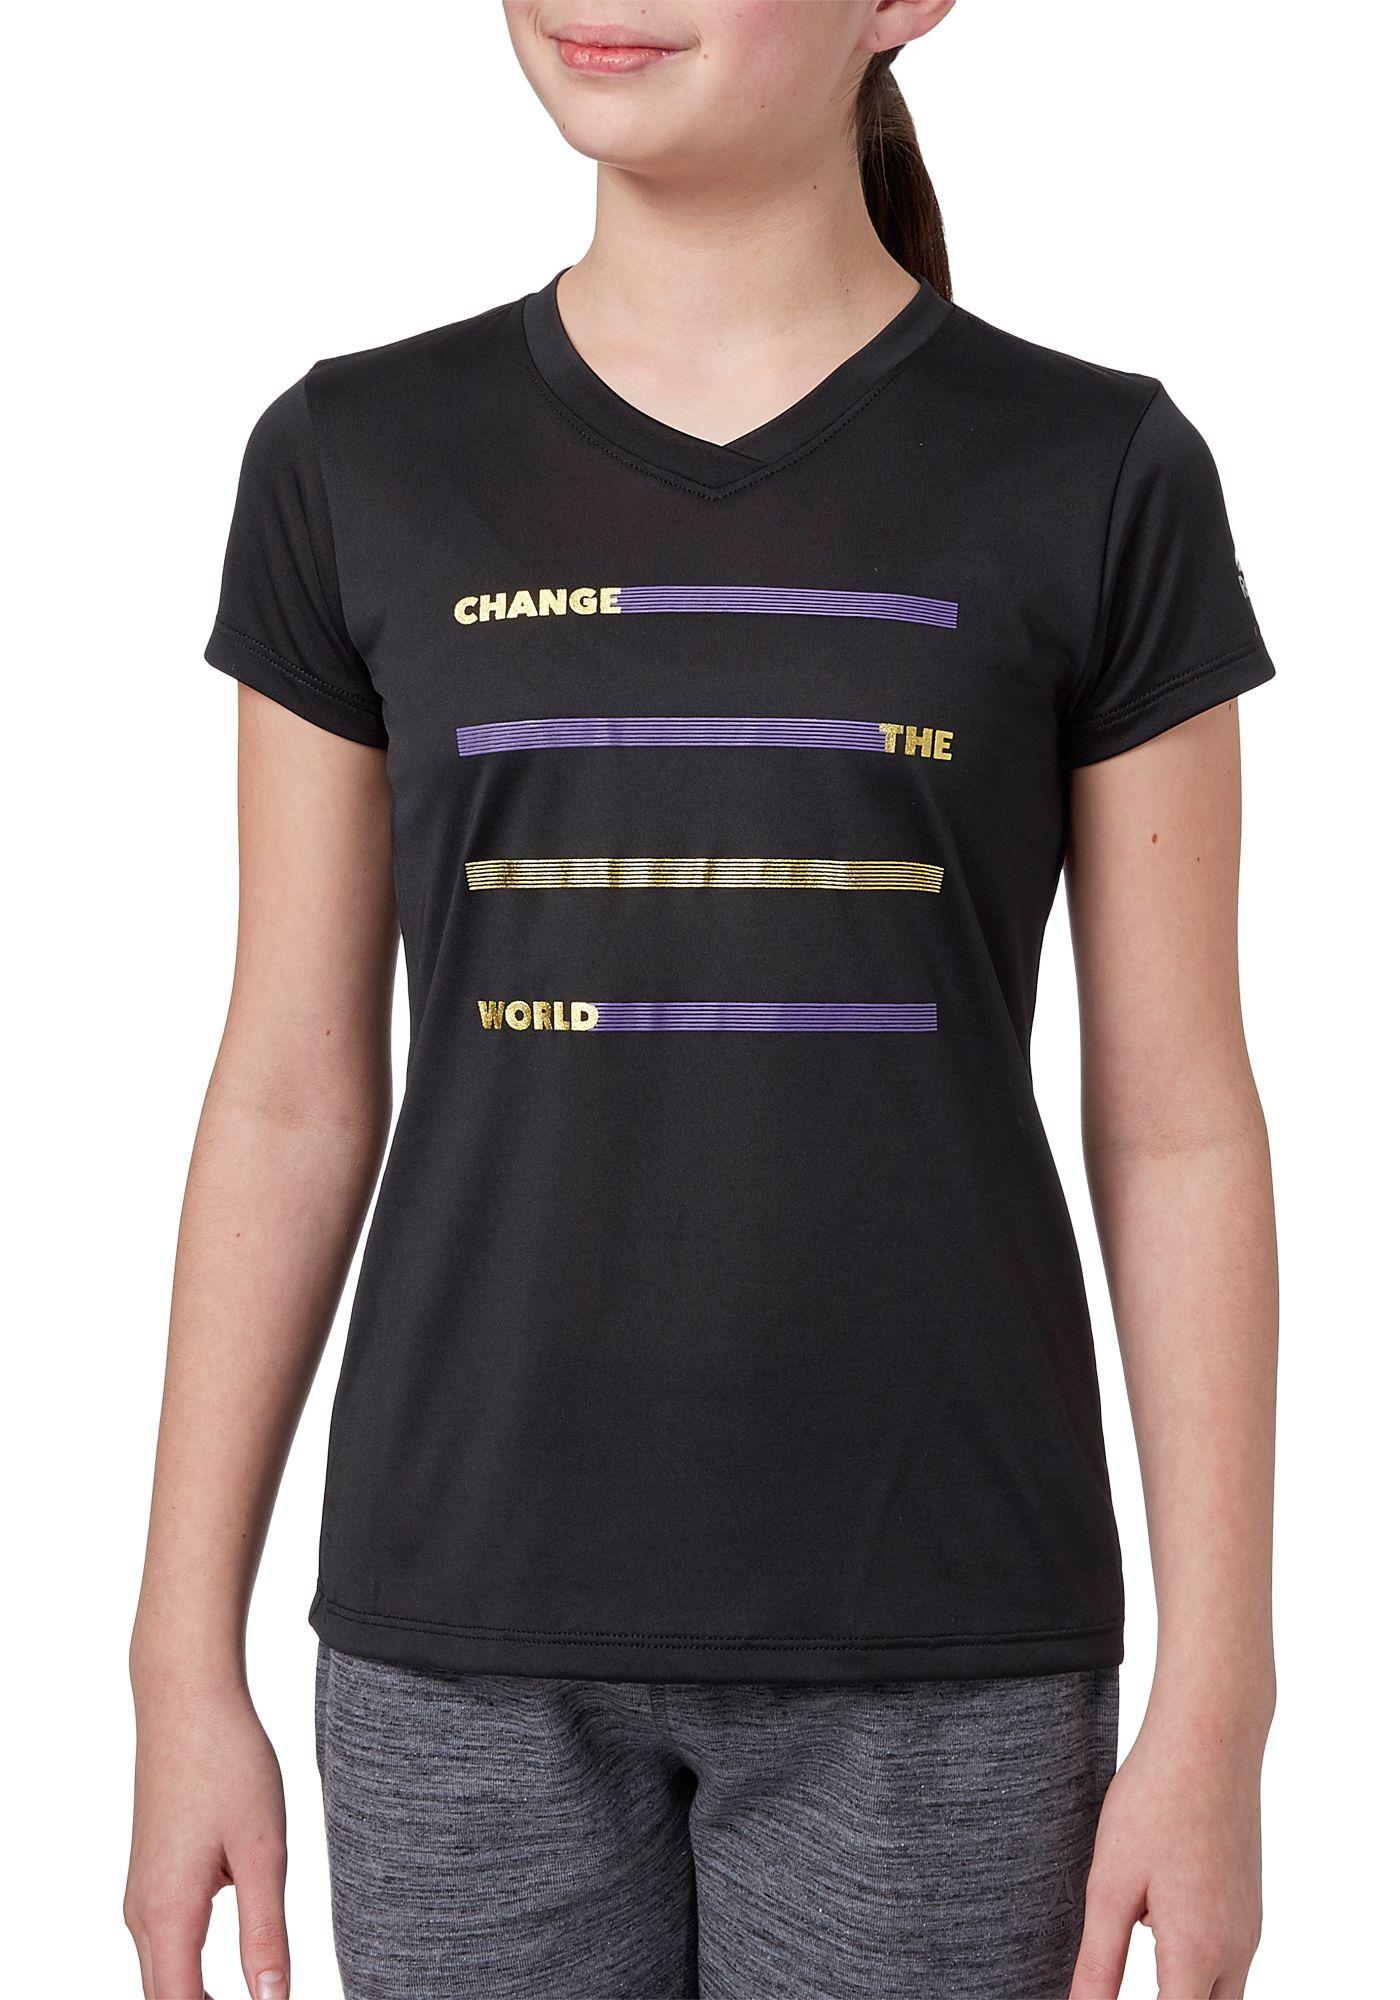 Reebok Girls' Performance Graphic V-Neck T-Shirt